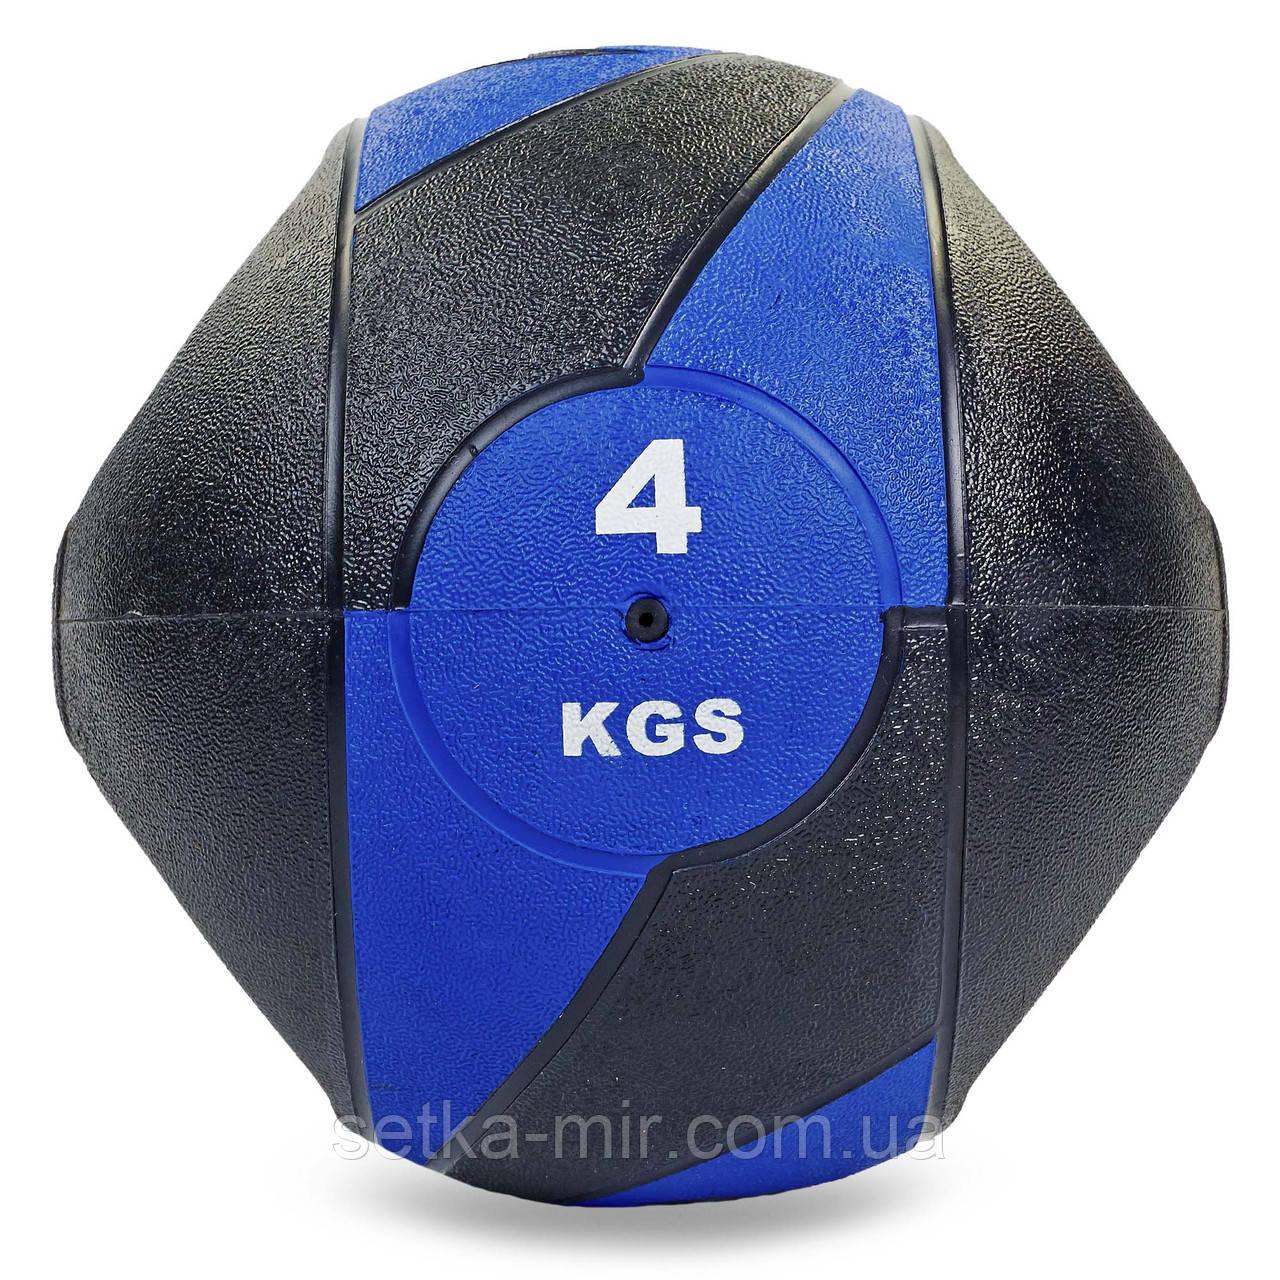 М'яч медичний медбол з двома ручками Record Medicine Ball FI-5111-4 4кг